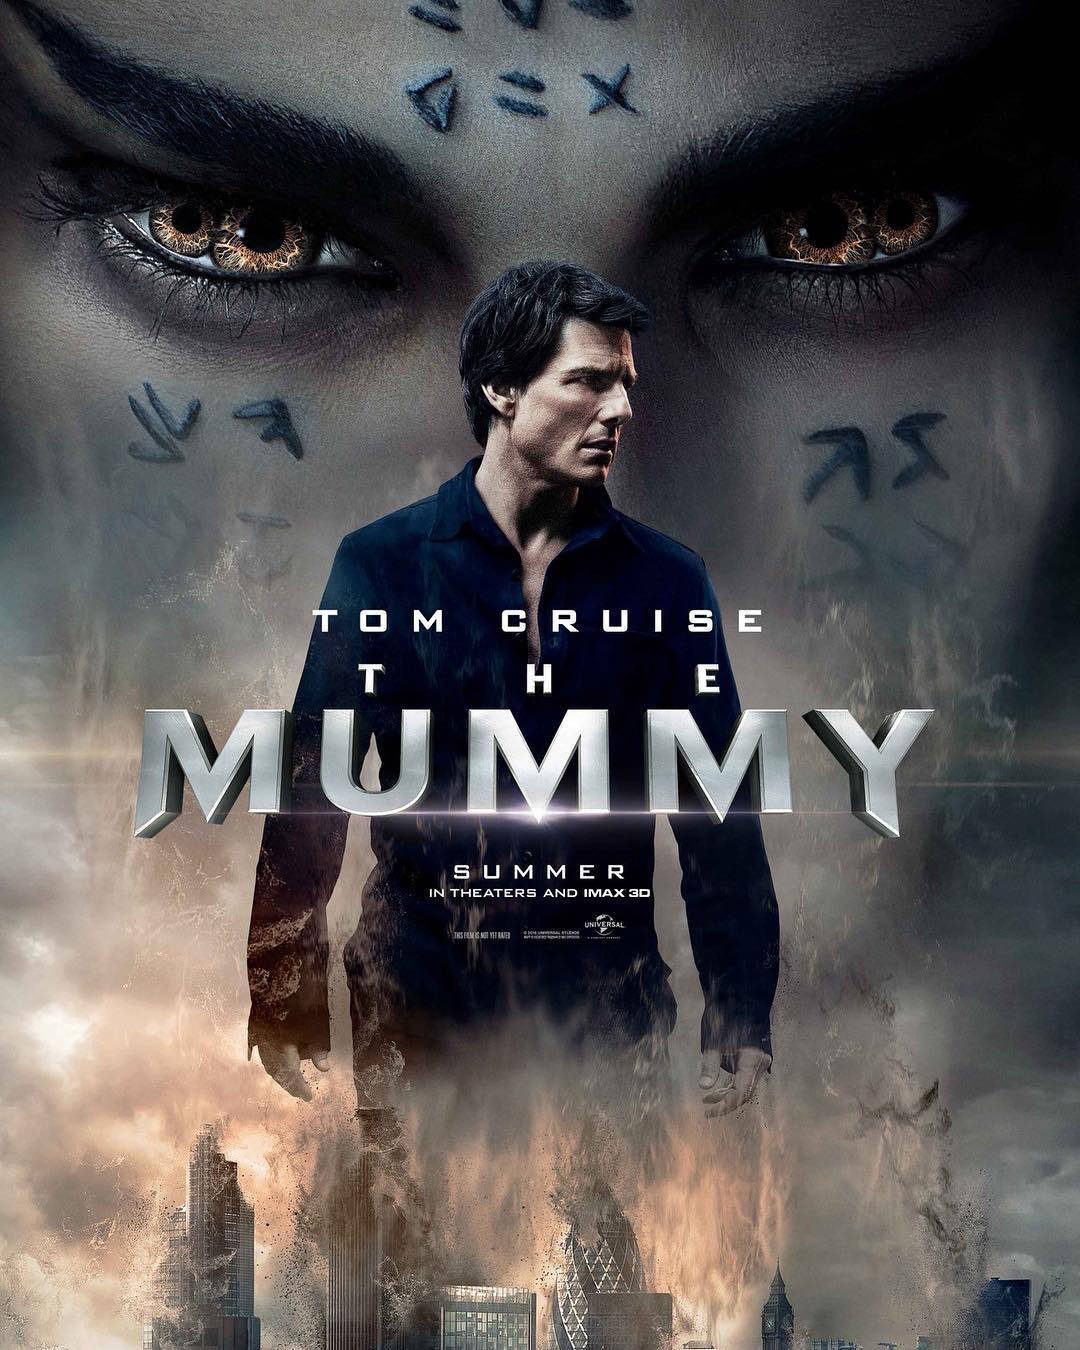 The Mummy (Dark Universe) The-mummy-poster-2-988842